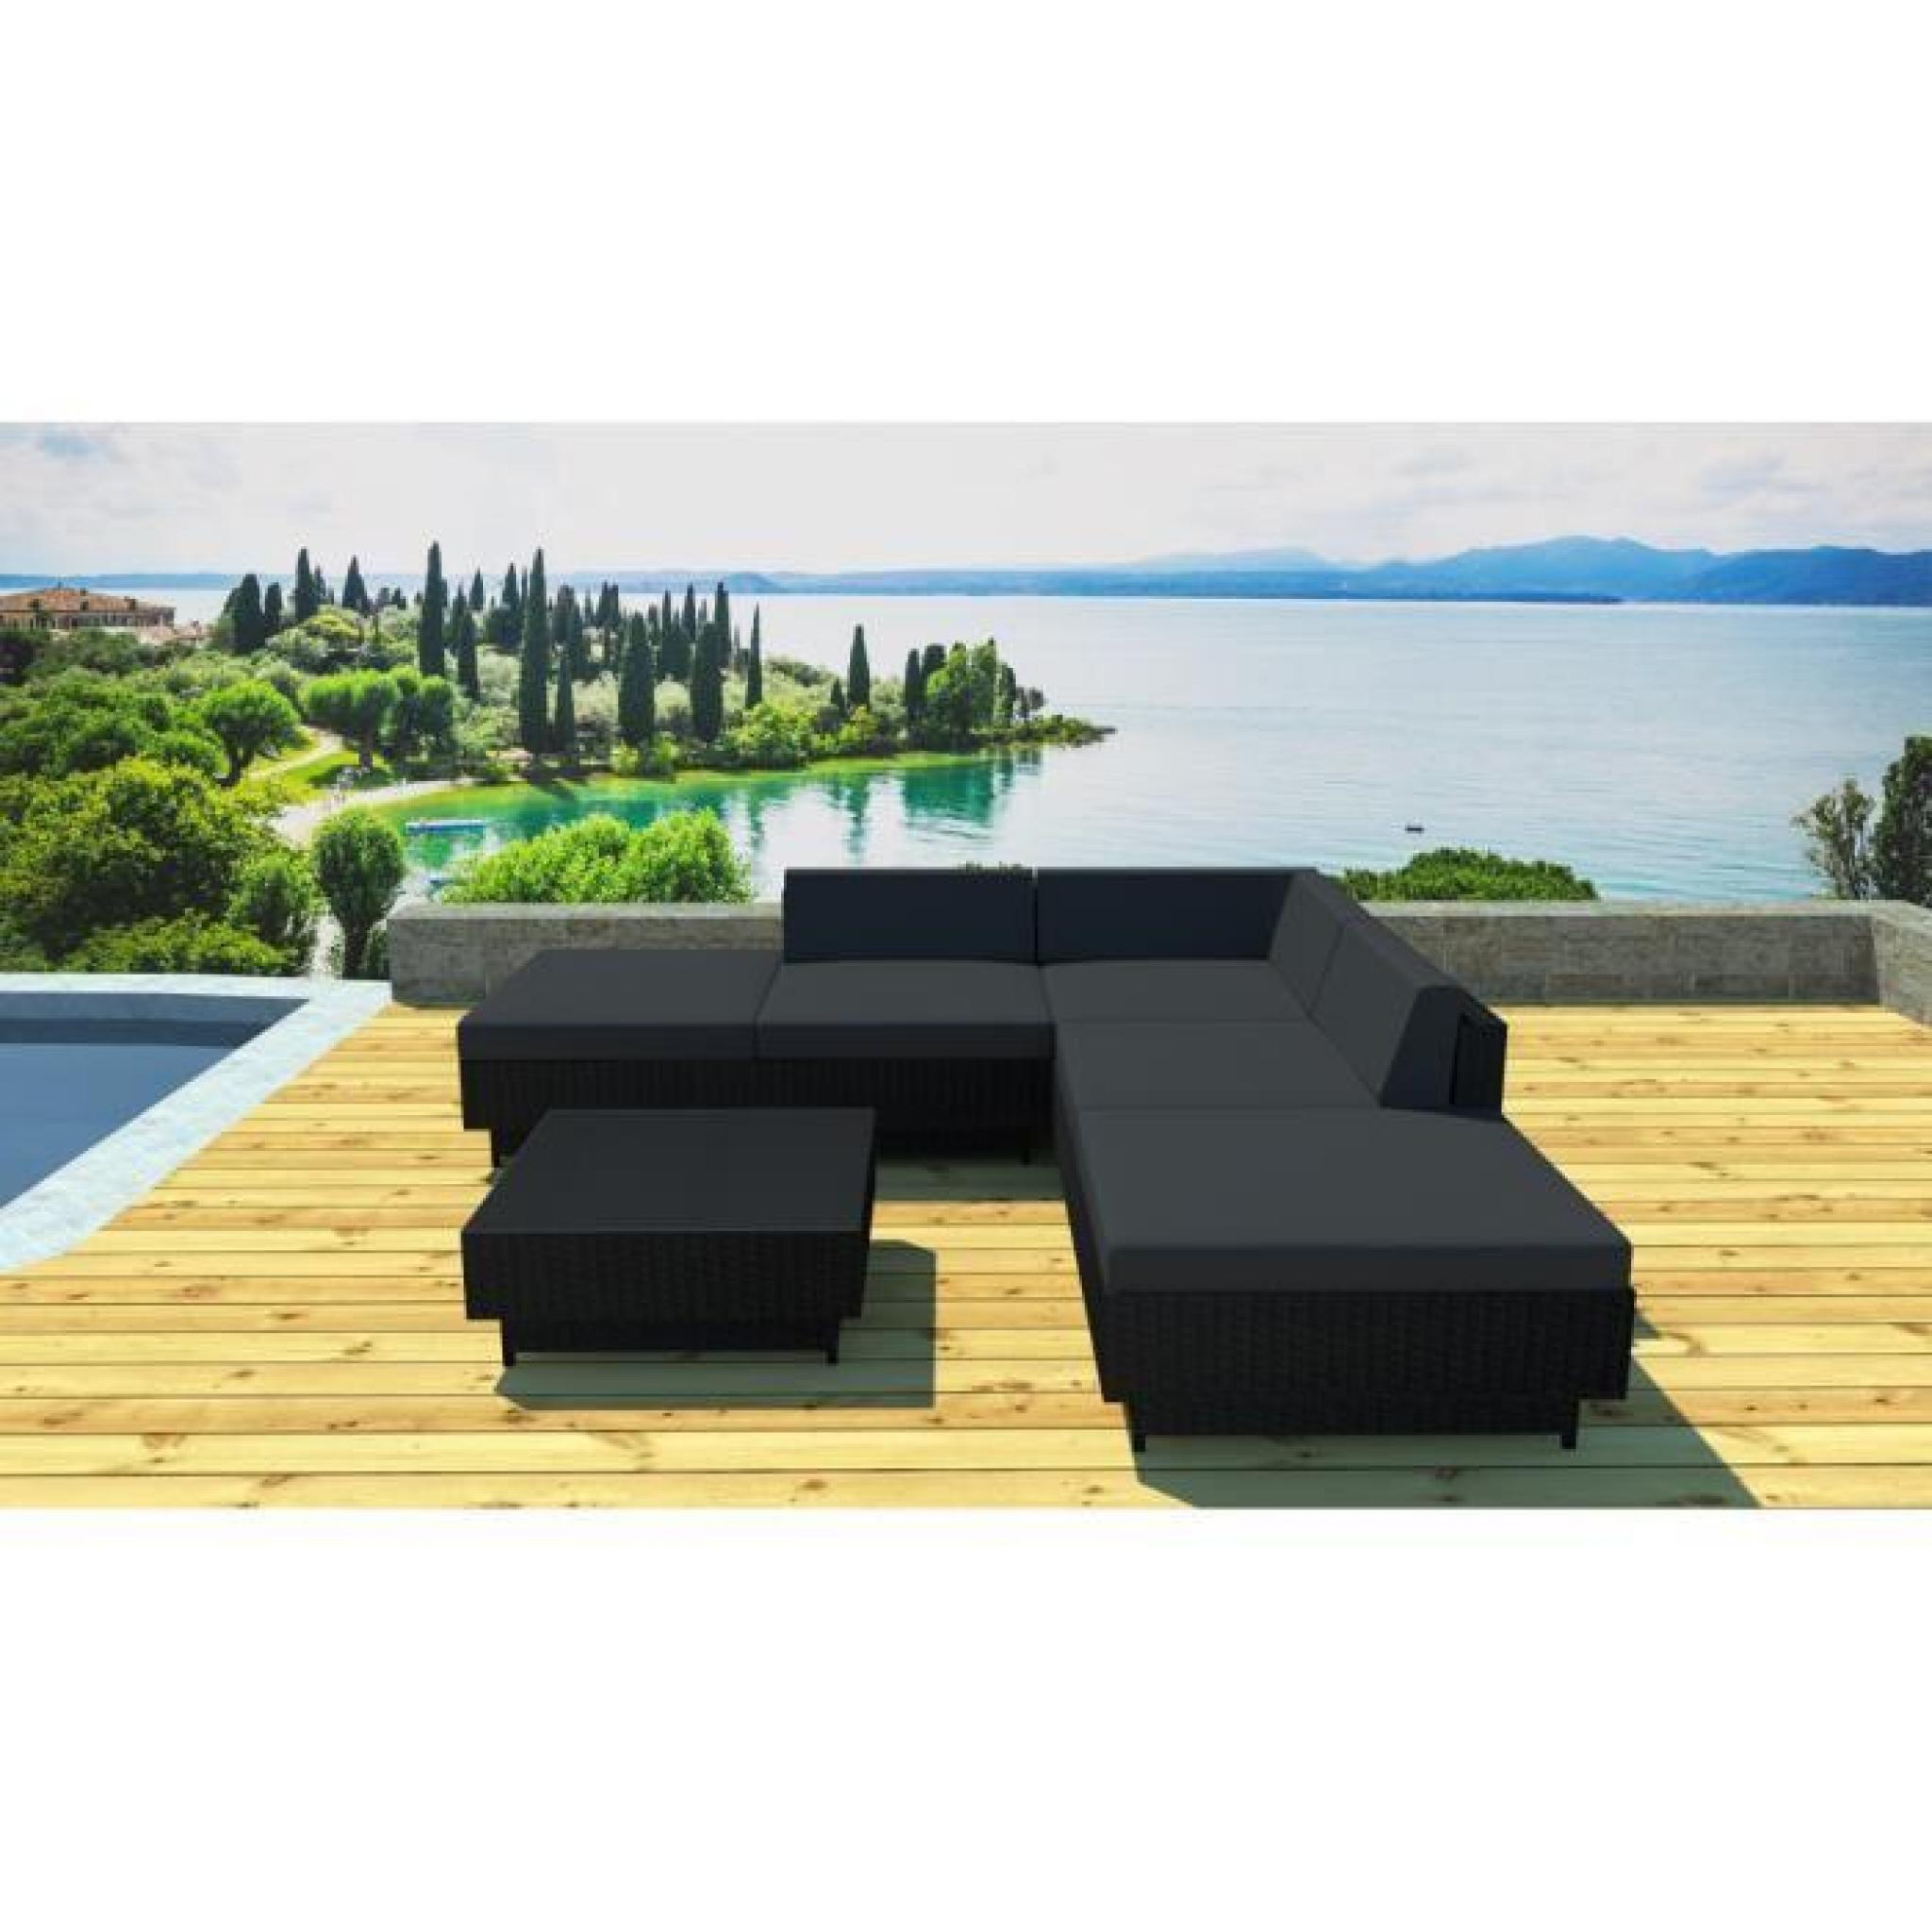 Salon jardin en résine tressée 6 éléments Noir/noir